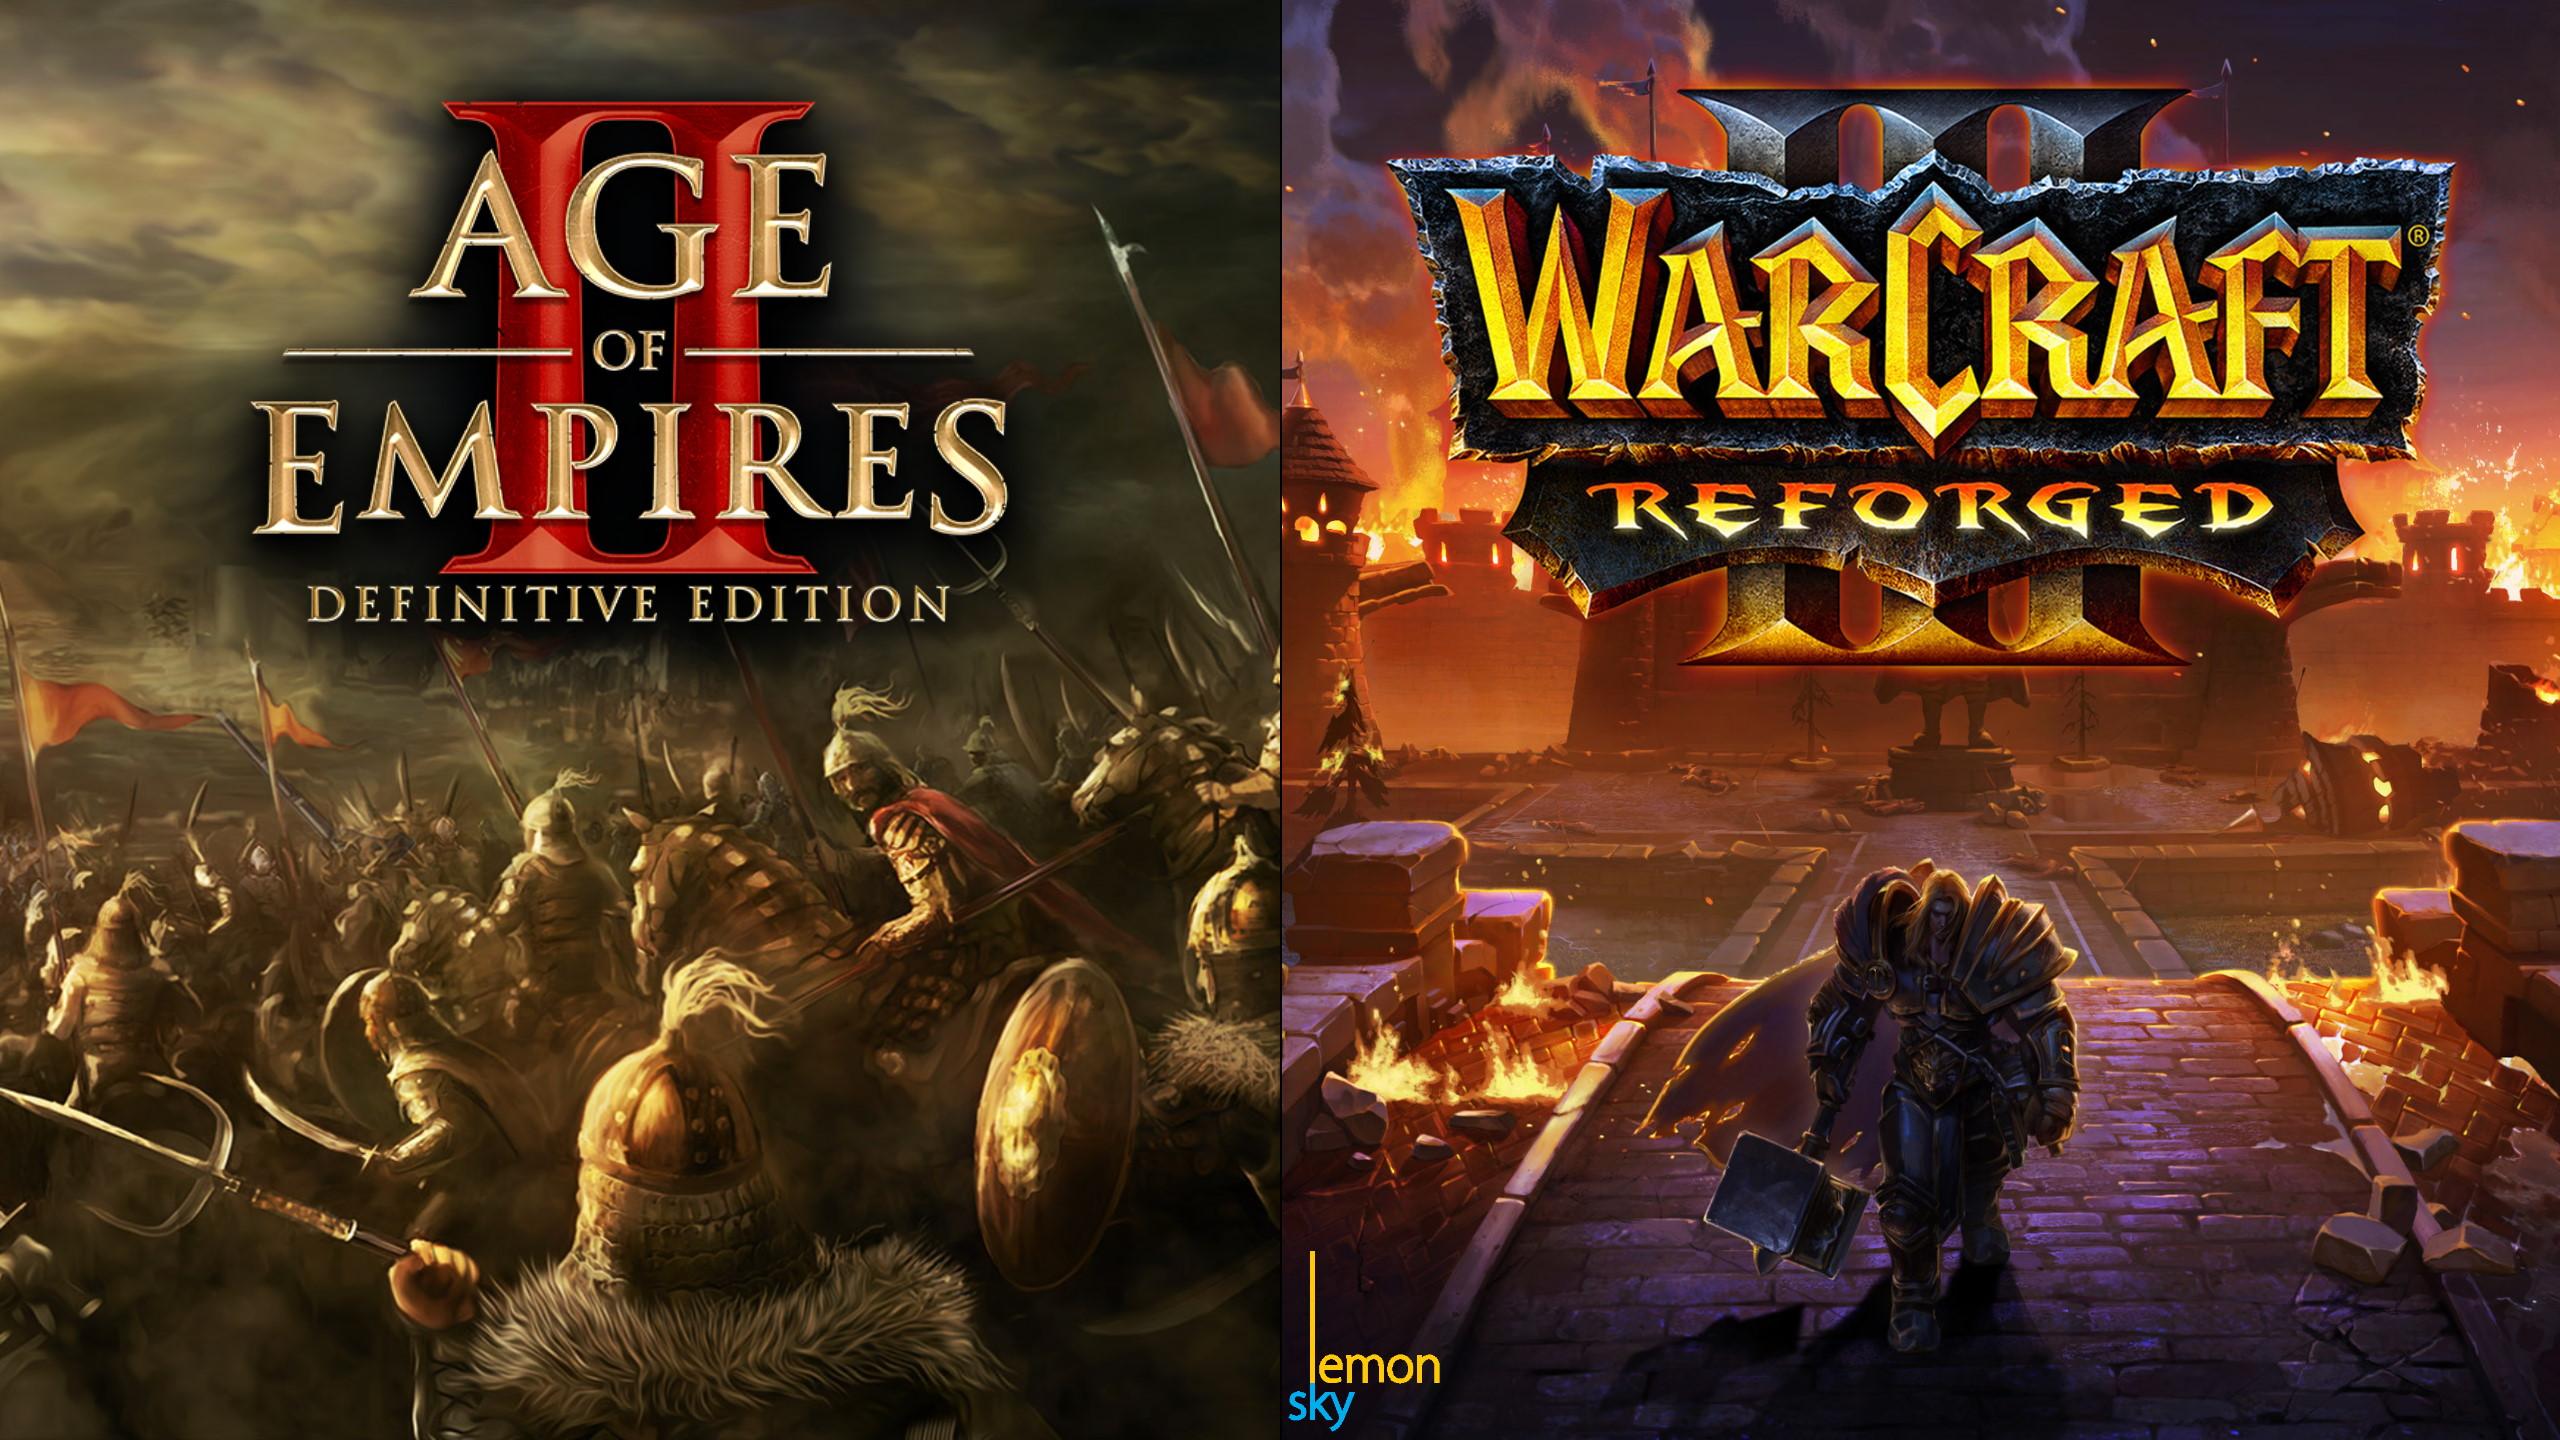 Title. Links: Age of Empires 2 HD Promo. Rechts: Ending Screen Artwort für Blizzcon Demo of WarCraft 3 Reforged von Ken Wong